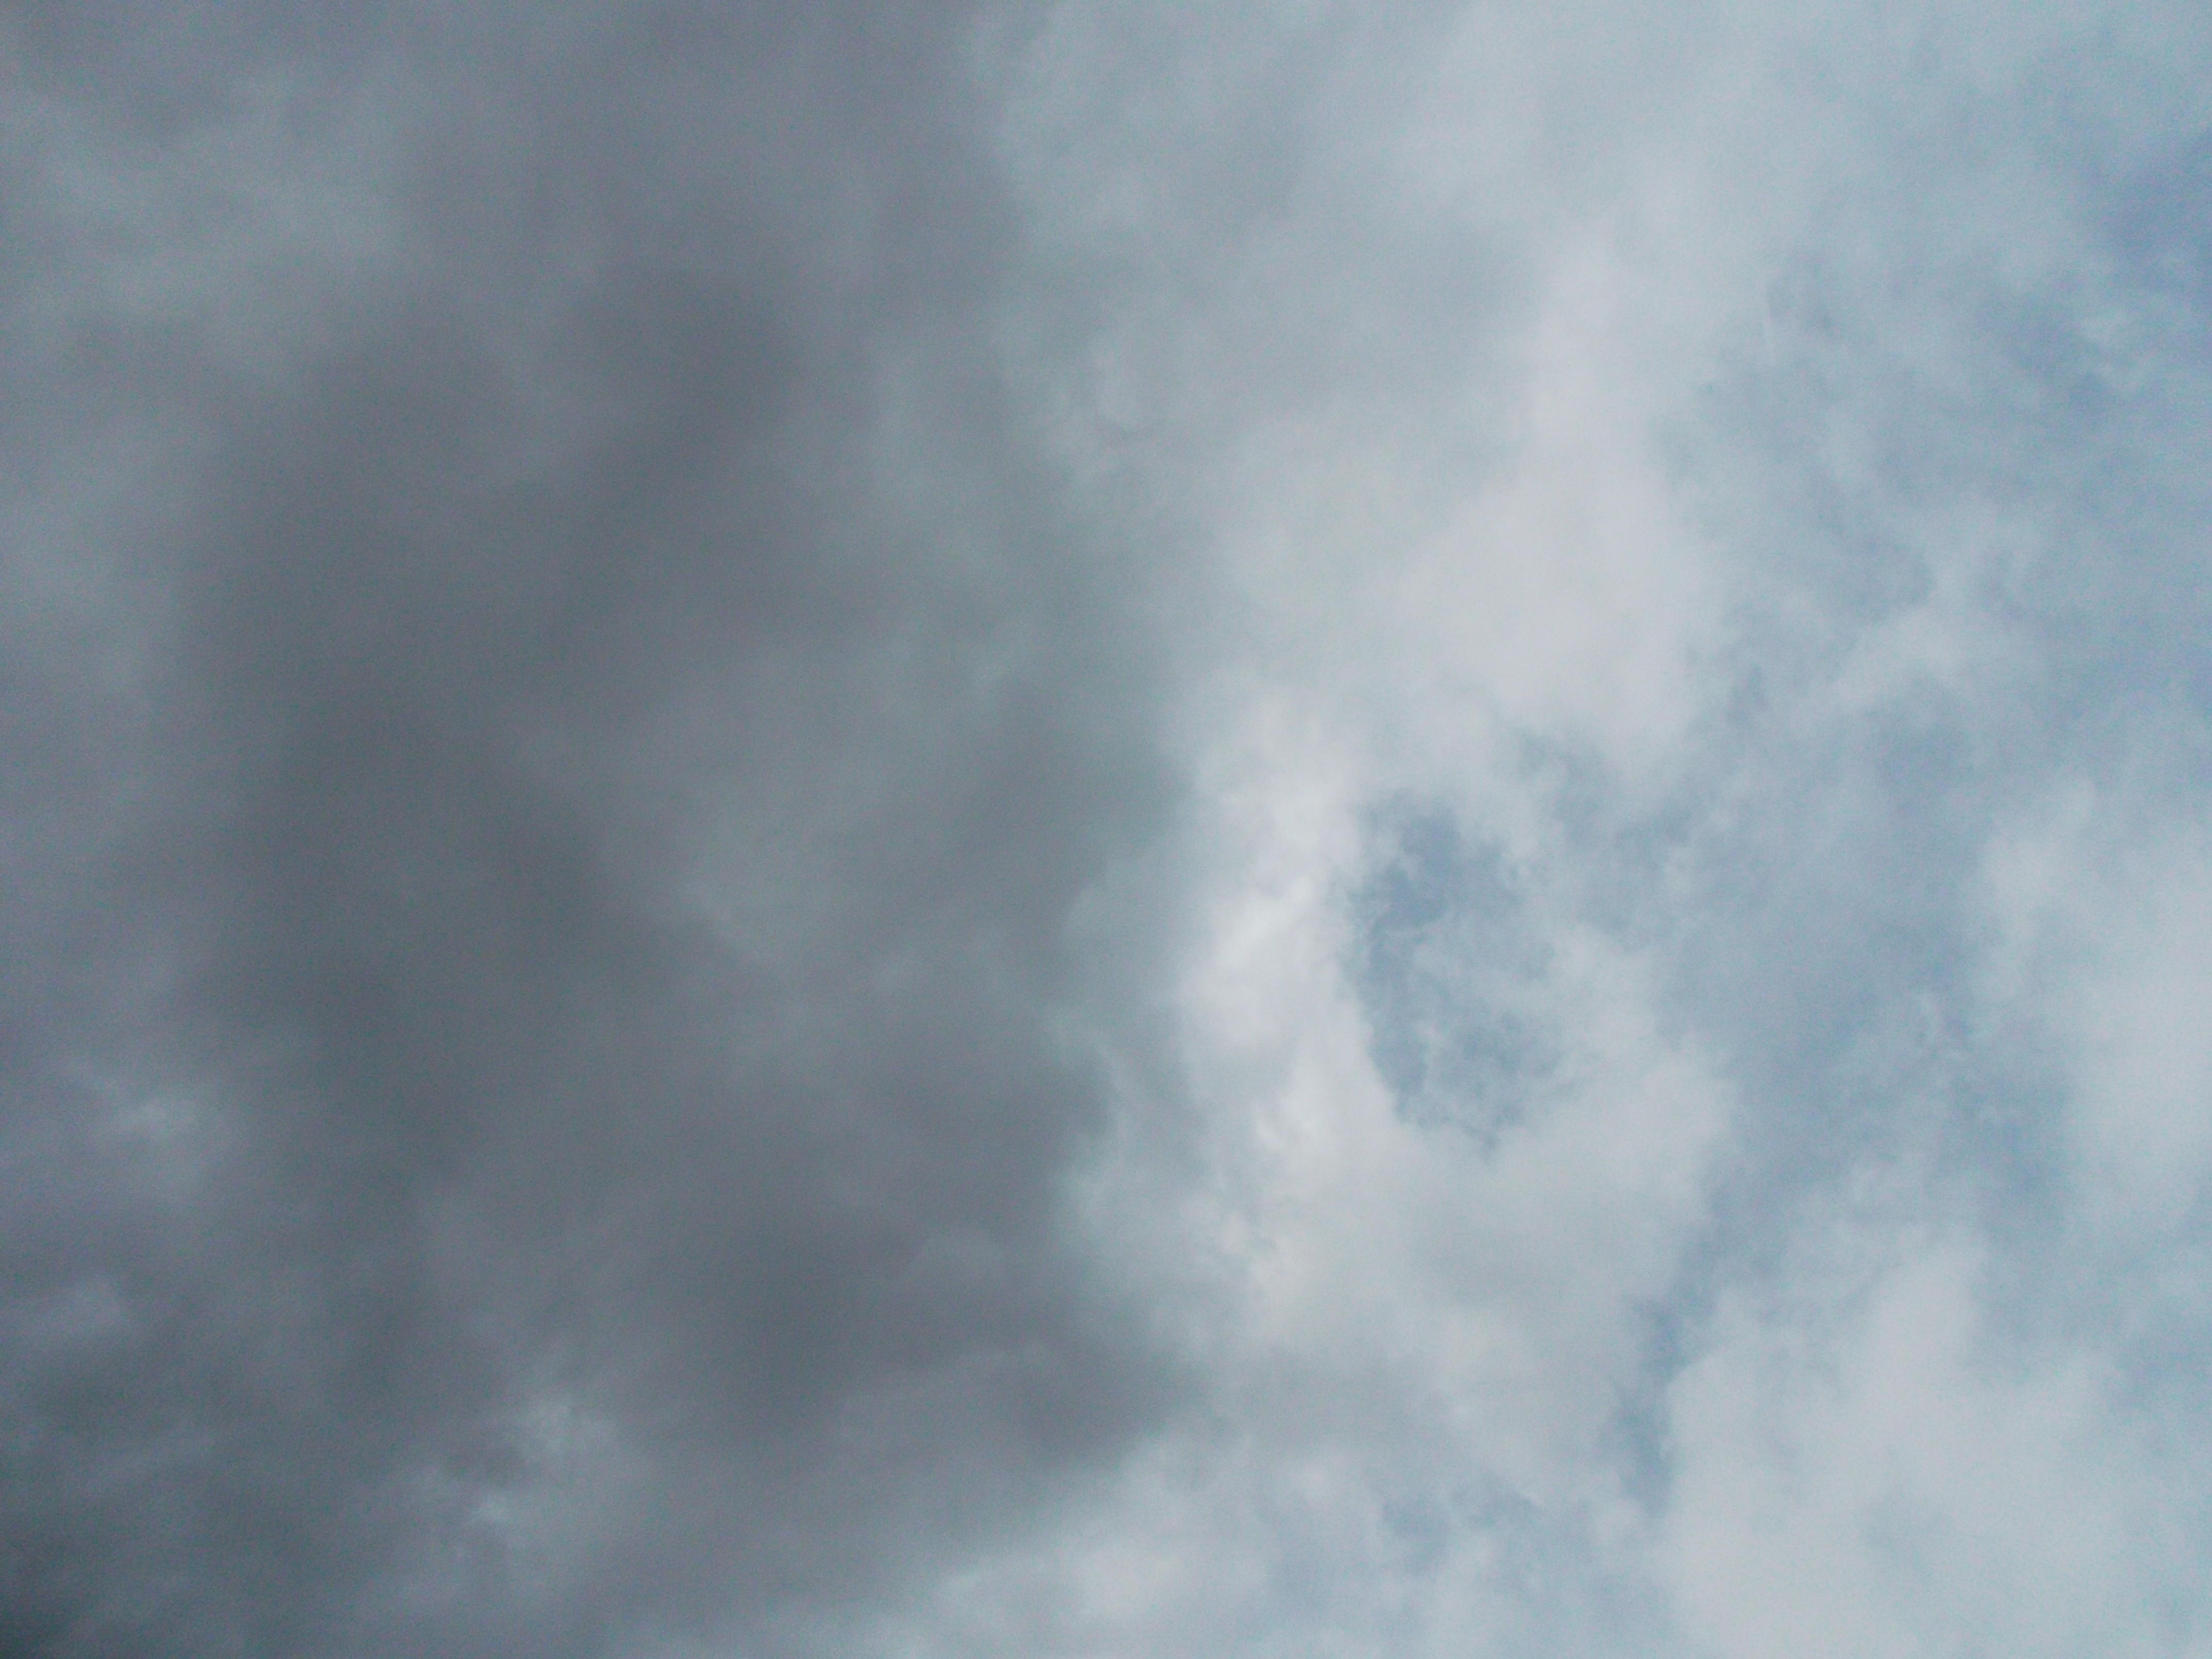 2013-04-11 Longitude -0.371 Latitude 49.182 Altitude 29 Heure 13h13